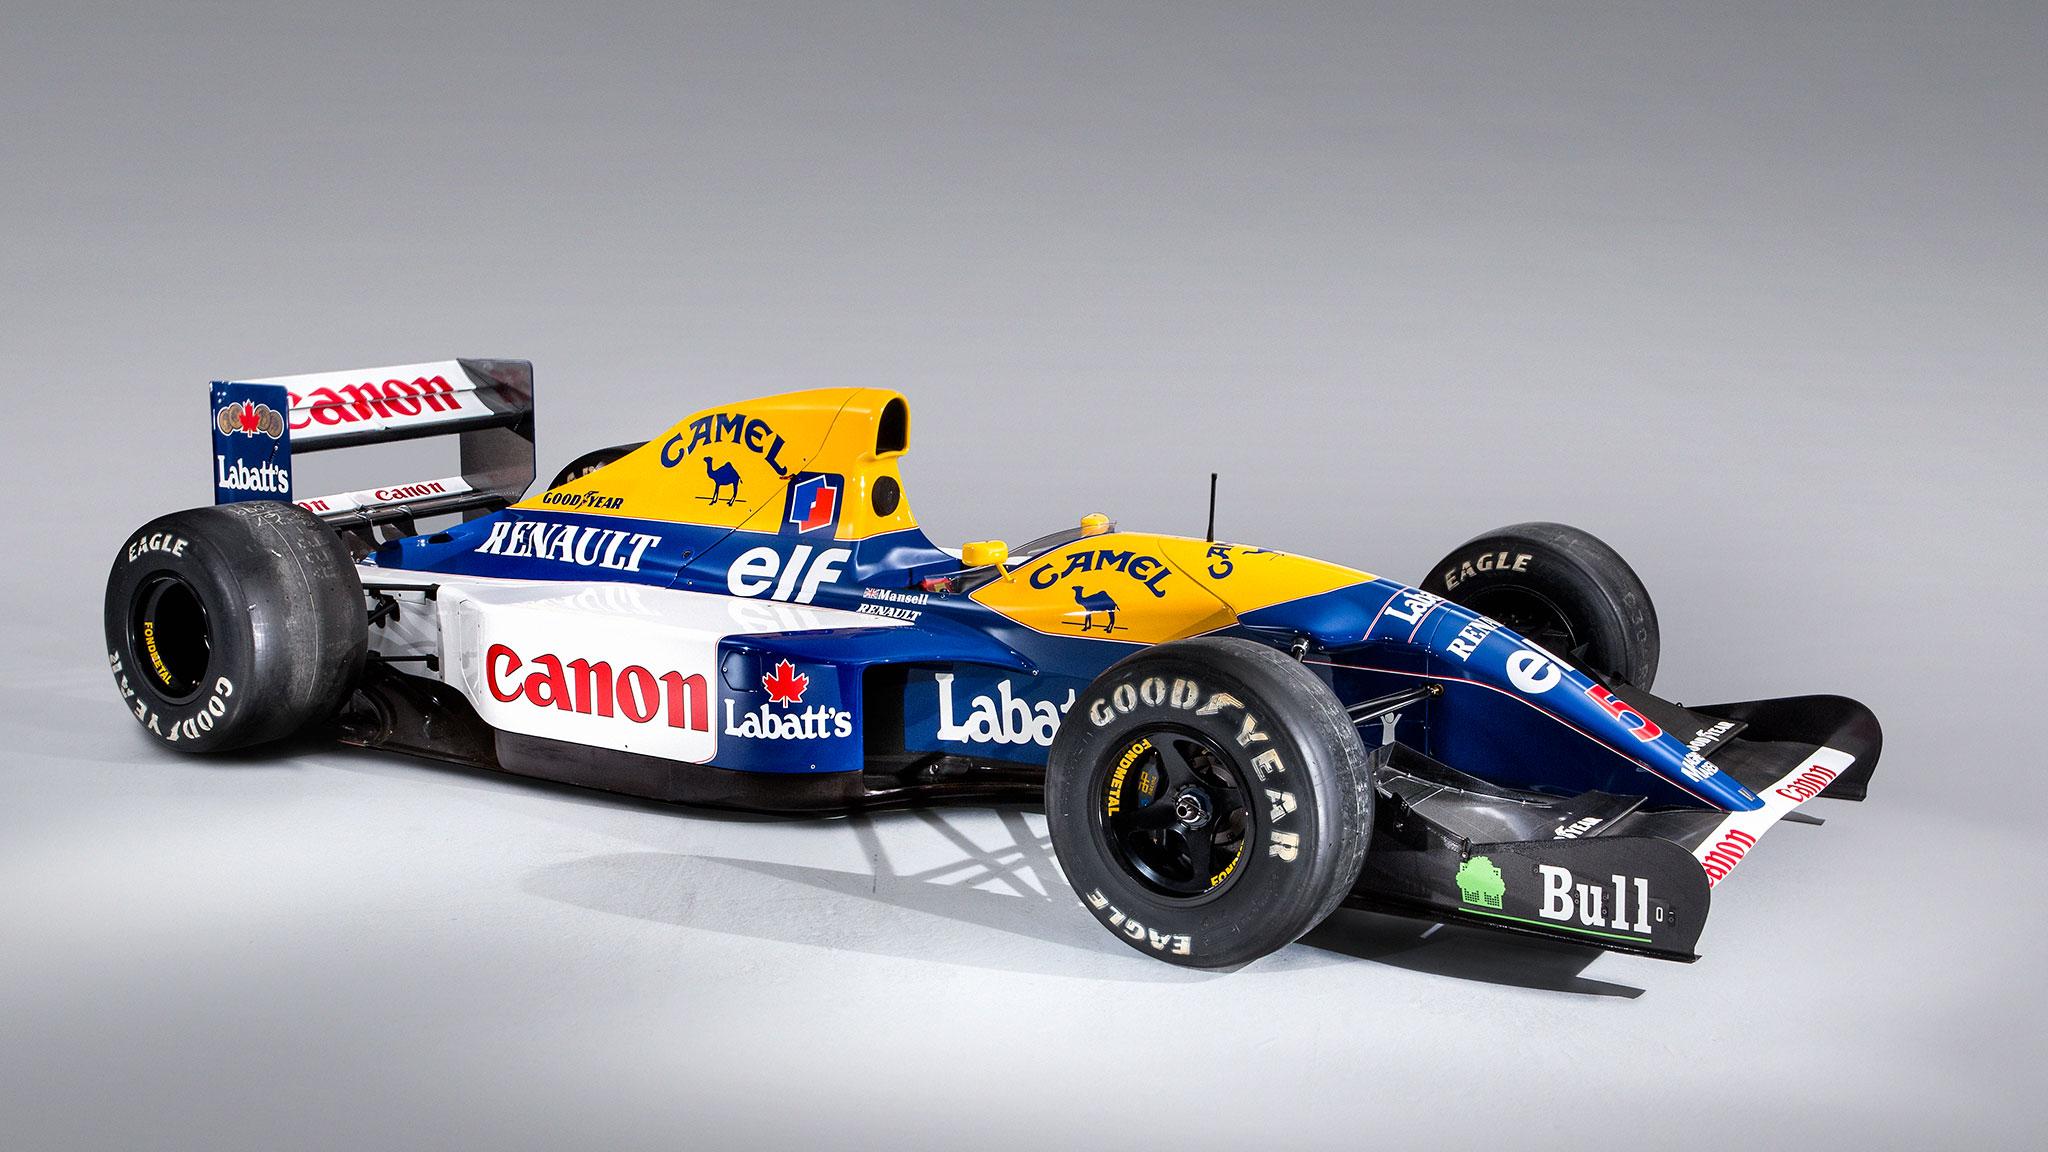 Mansell's 1992 Williams Formula 1 Car Wins Again | Automobile Magazine